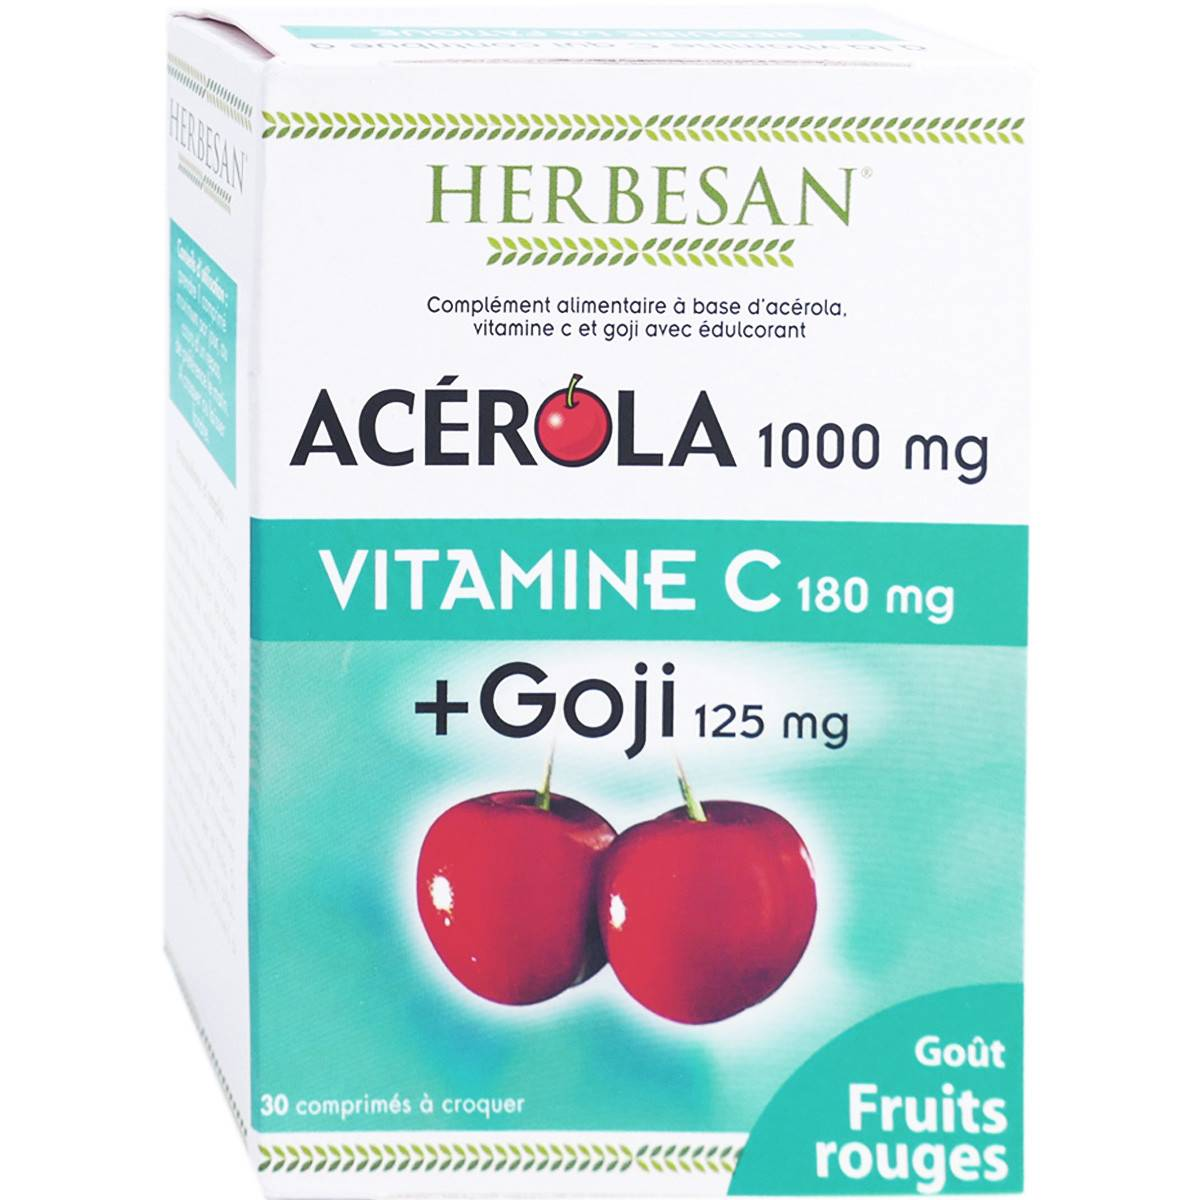 Herbesan acerola 1000 + goji vitamine c 30 comprimes